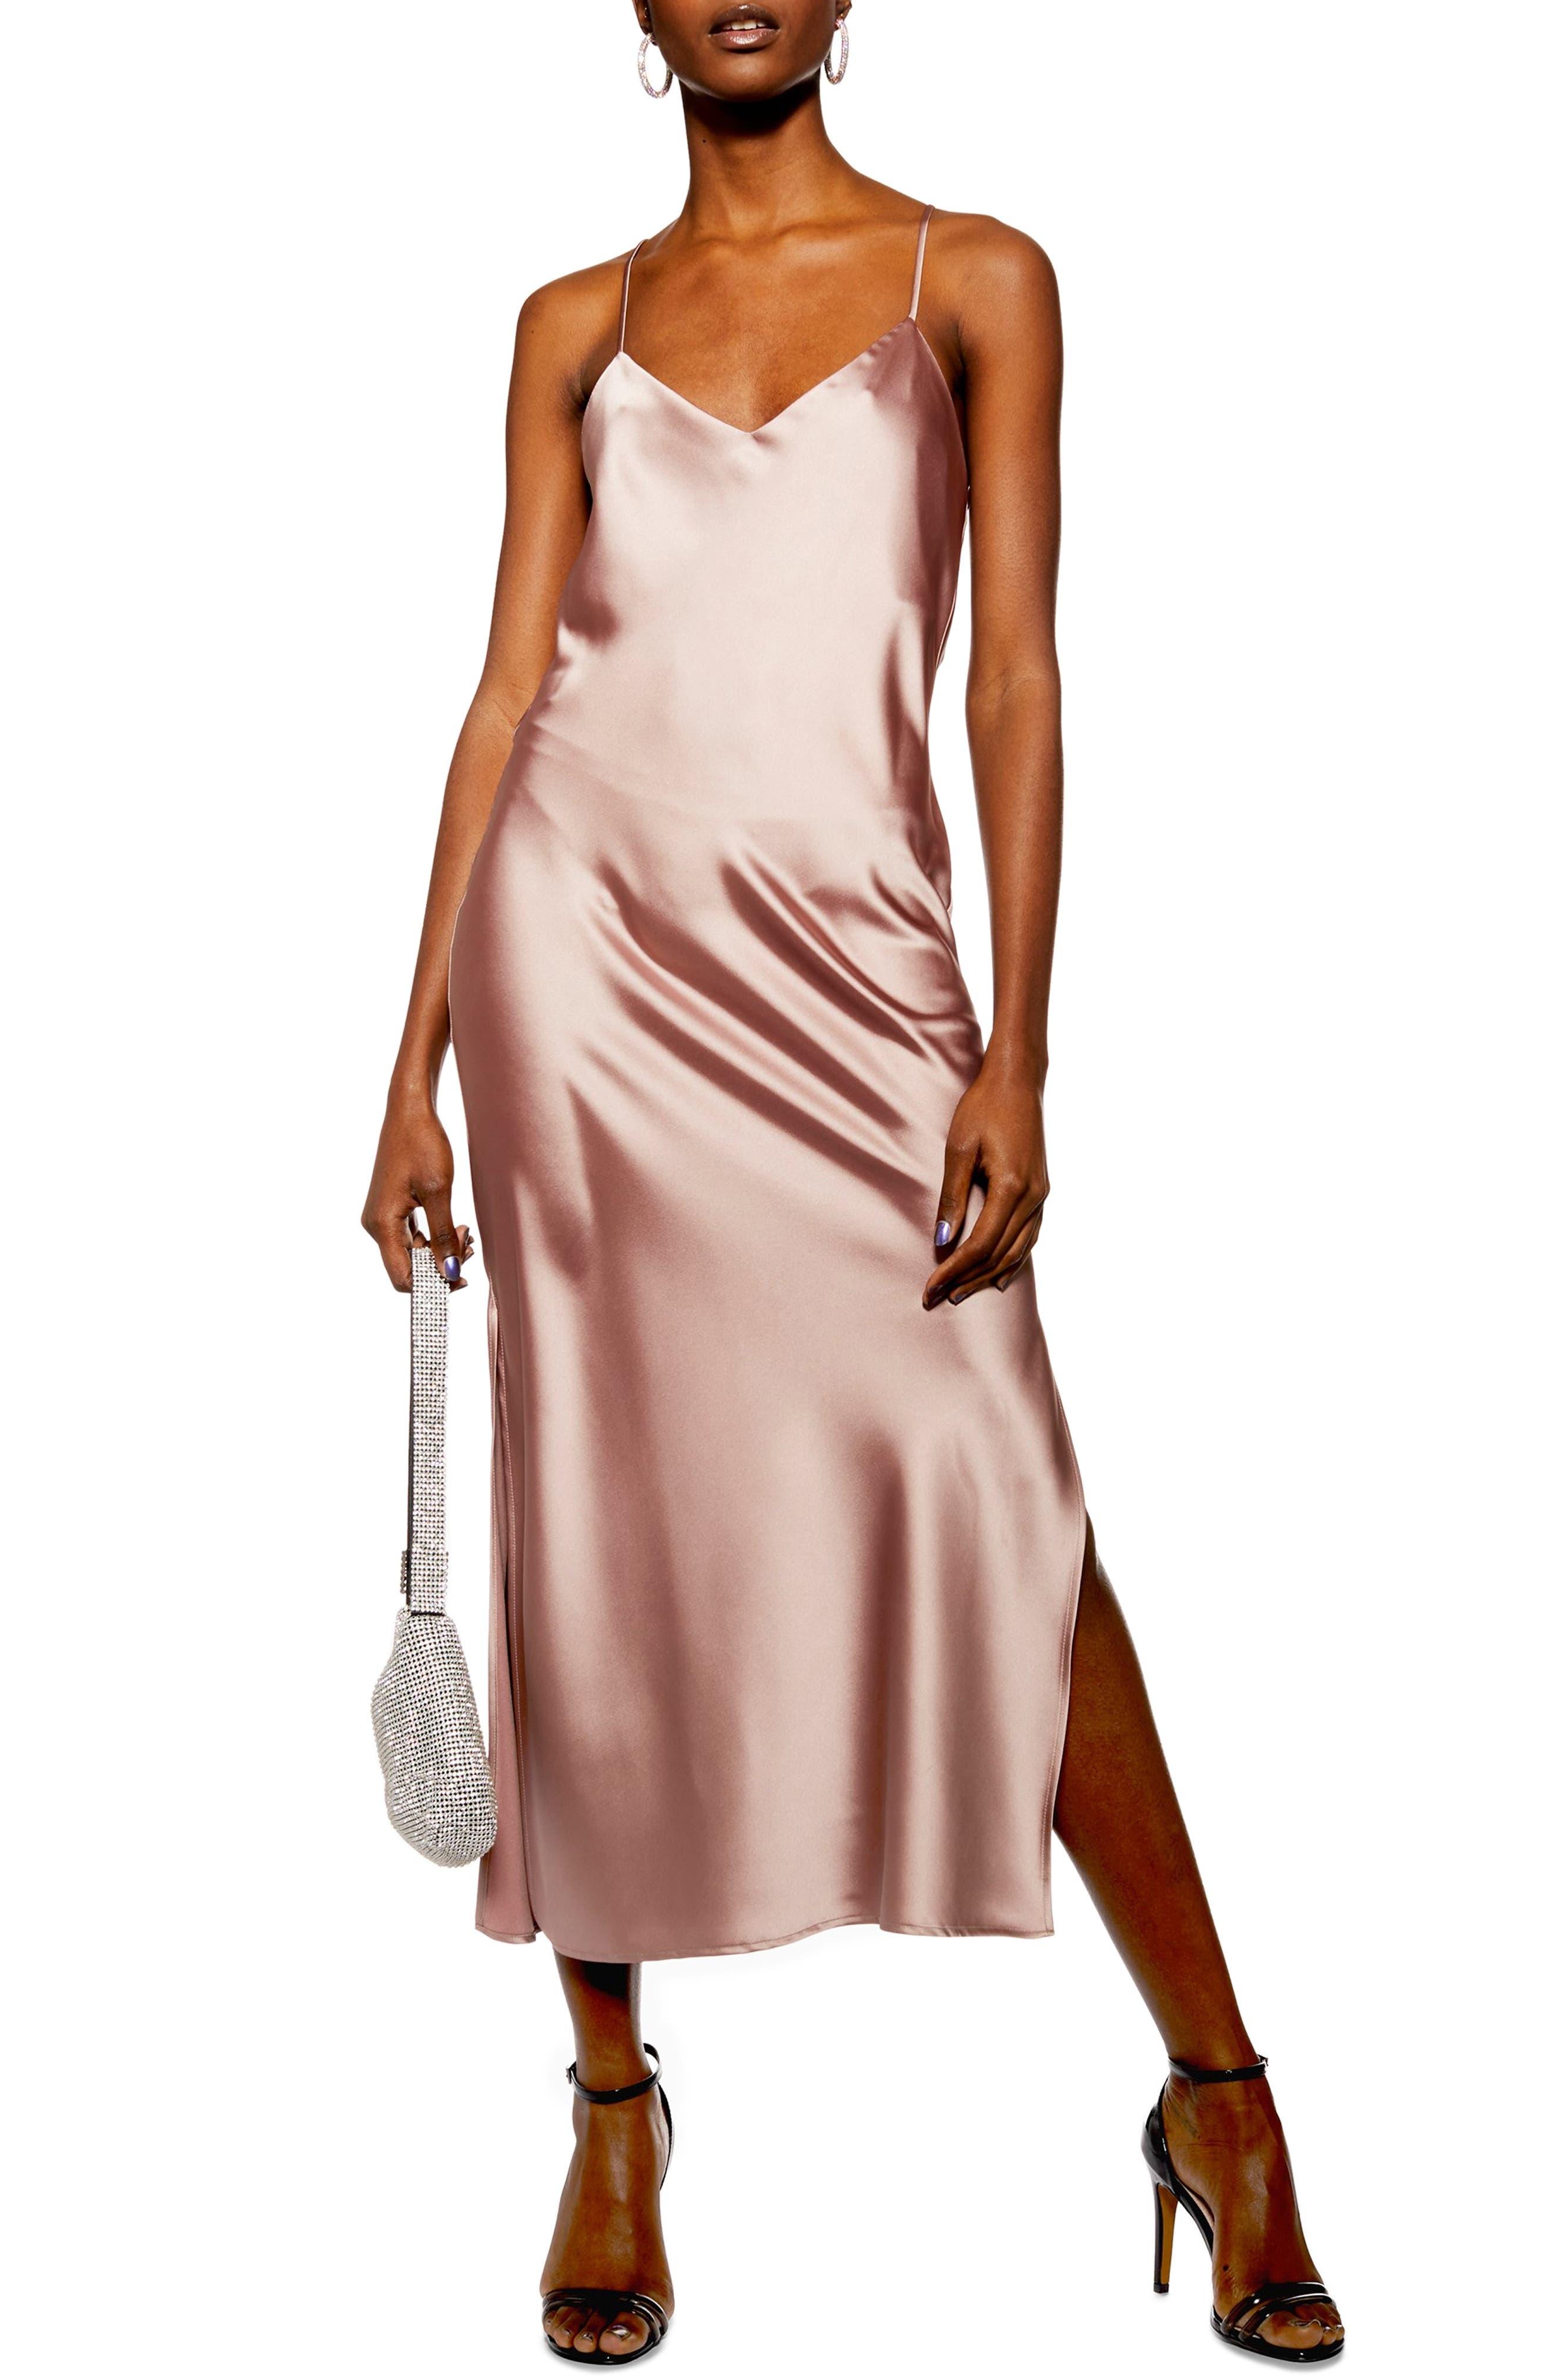 Topshop Plain Satin Slipdress, US (fits like 16-18) - Pink